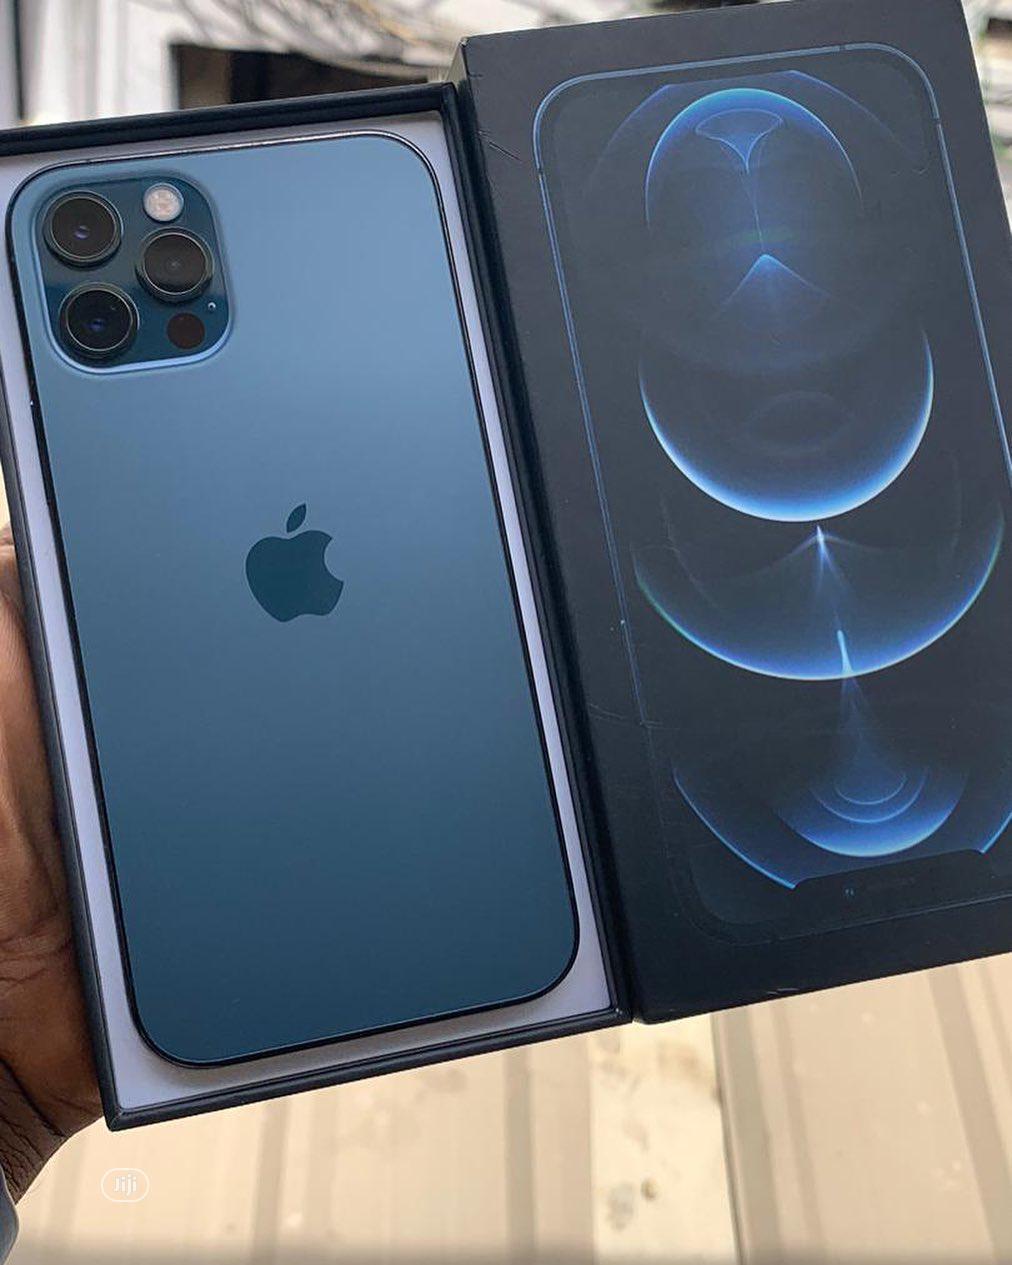 Apple iPhone 12 Pro Max 128GB | Mobile Phones for sale in Ikeja, Lagos State, Nigeria